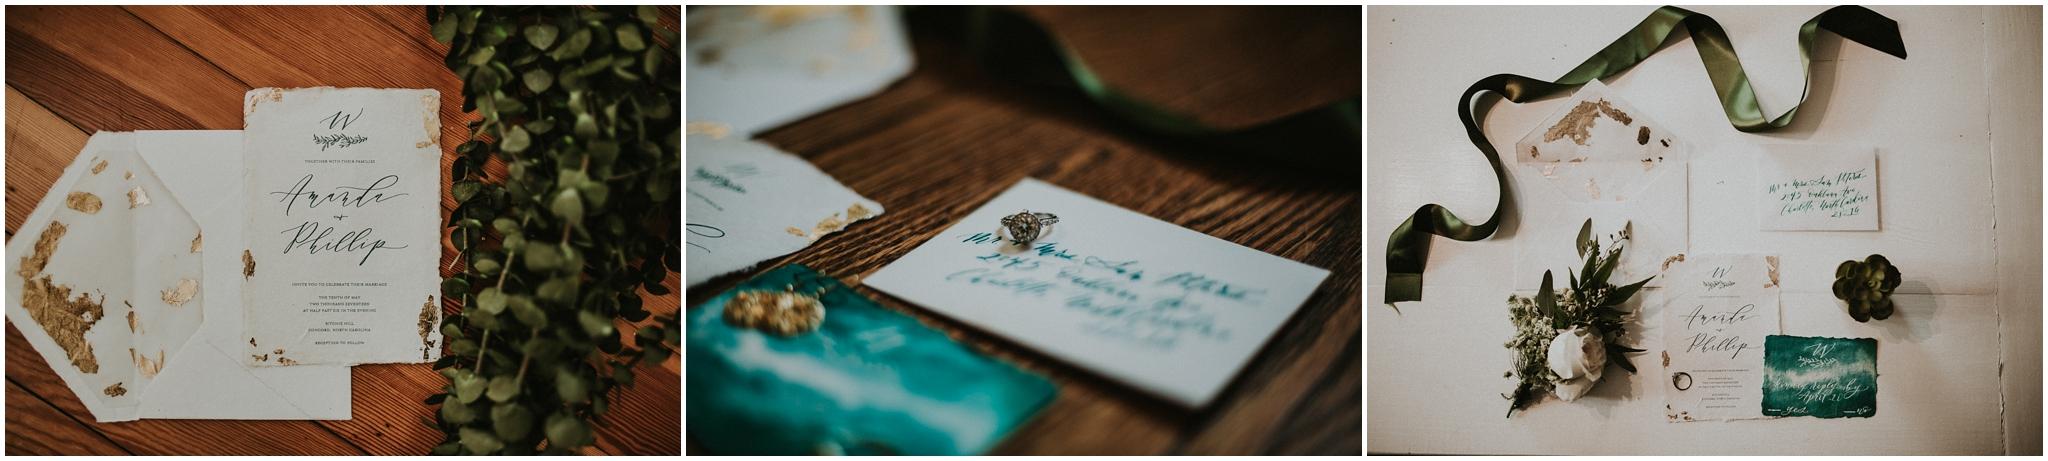 Wedding-photographer-ritchie-hill_0004.jpg